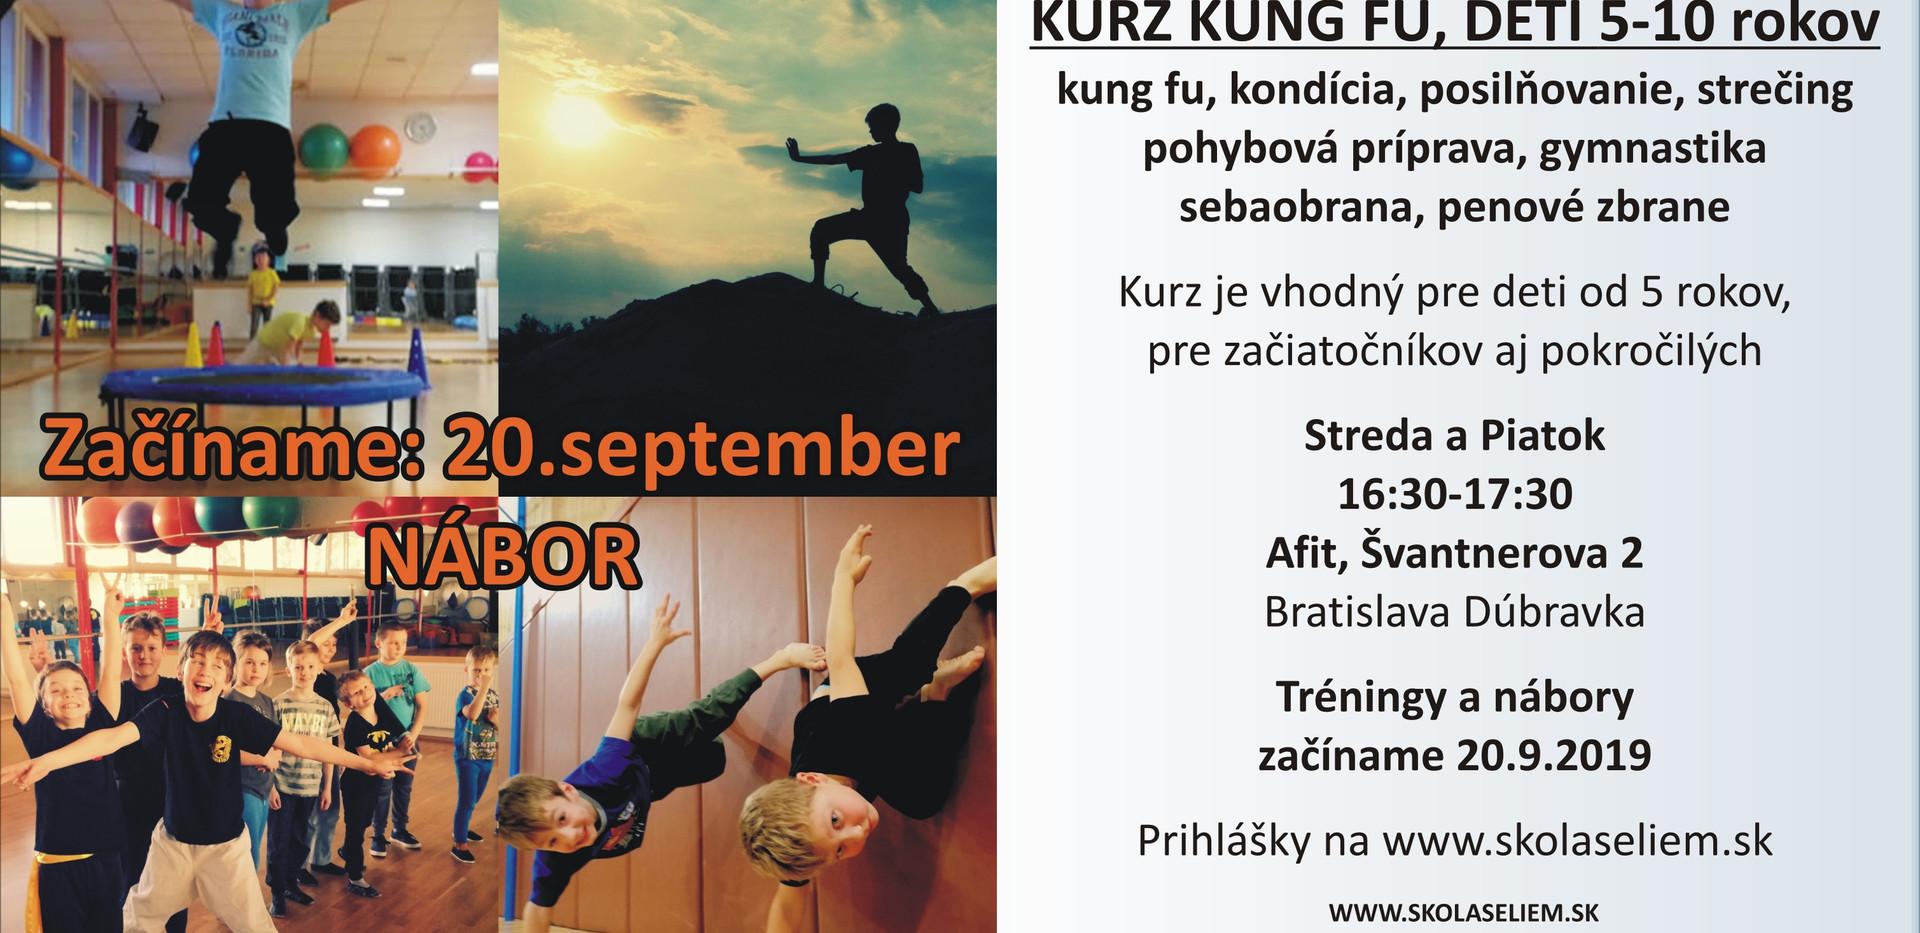 Kurzy Kung fu v Dúbravke pre deti